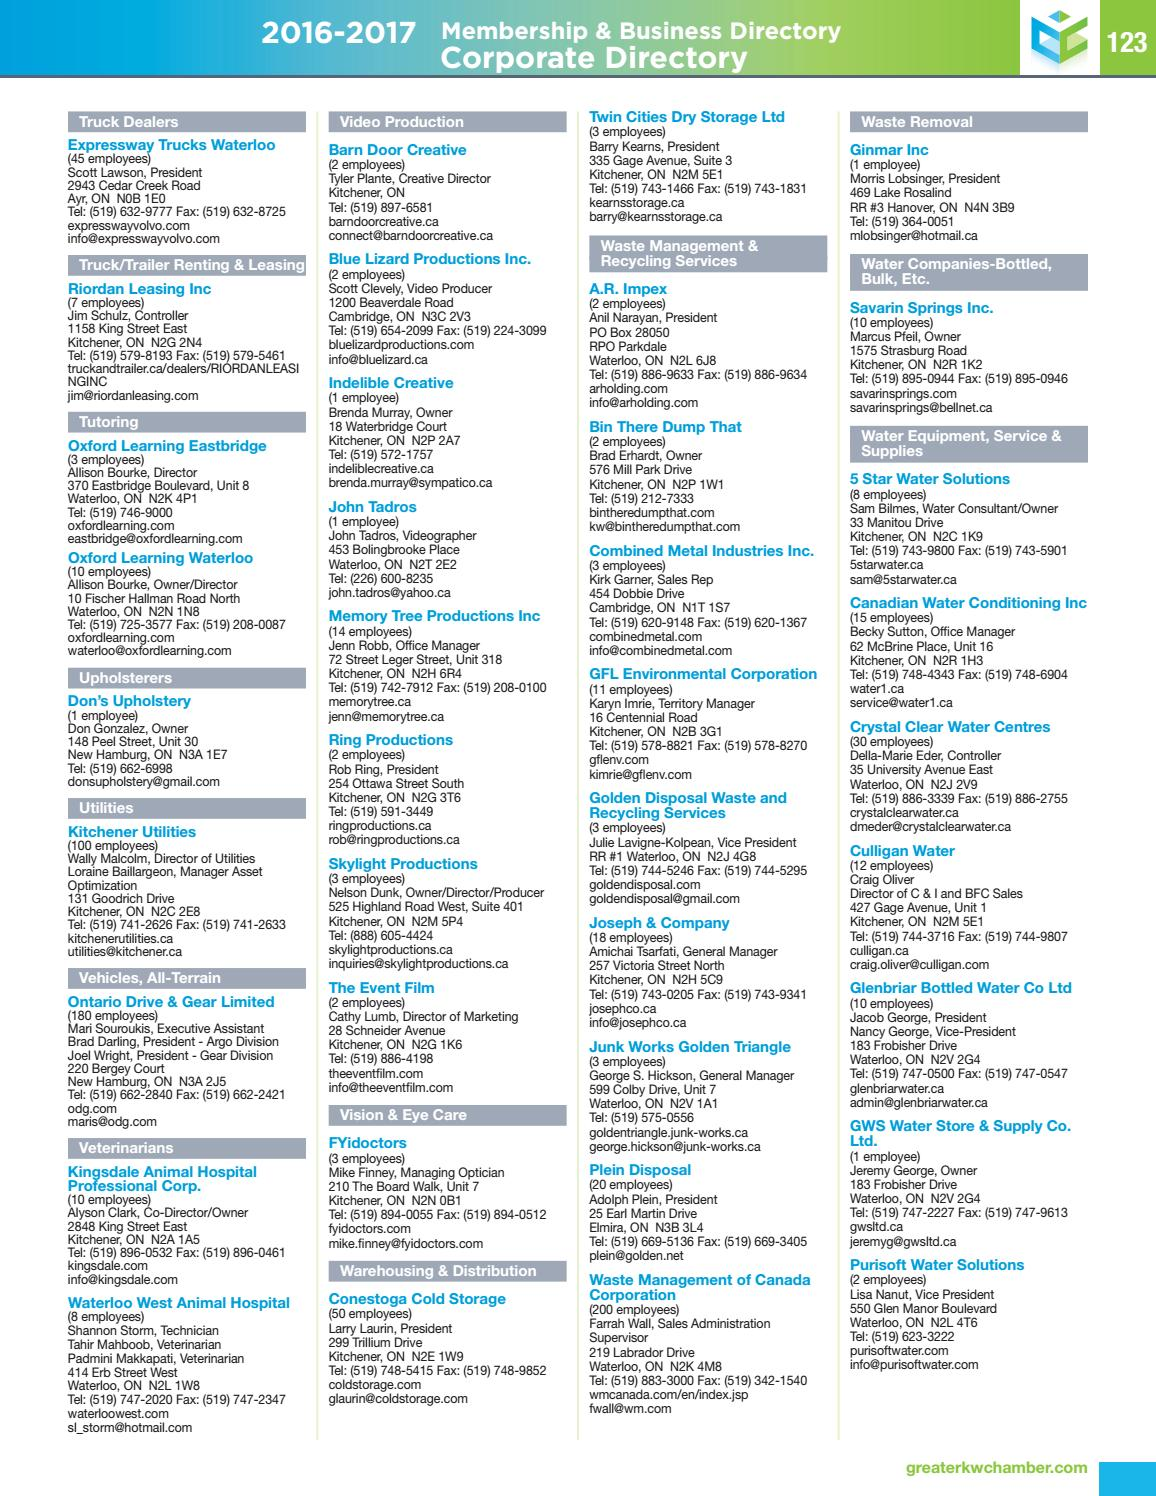 2016 - 2017 Membership & Business Directory by Natalie Hemmerich - issuu